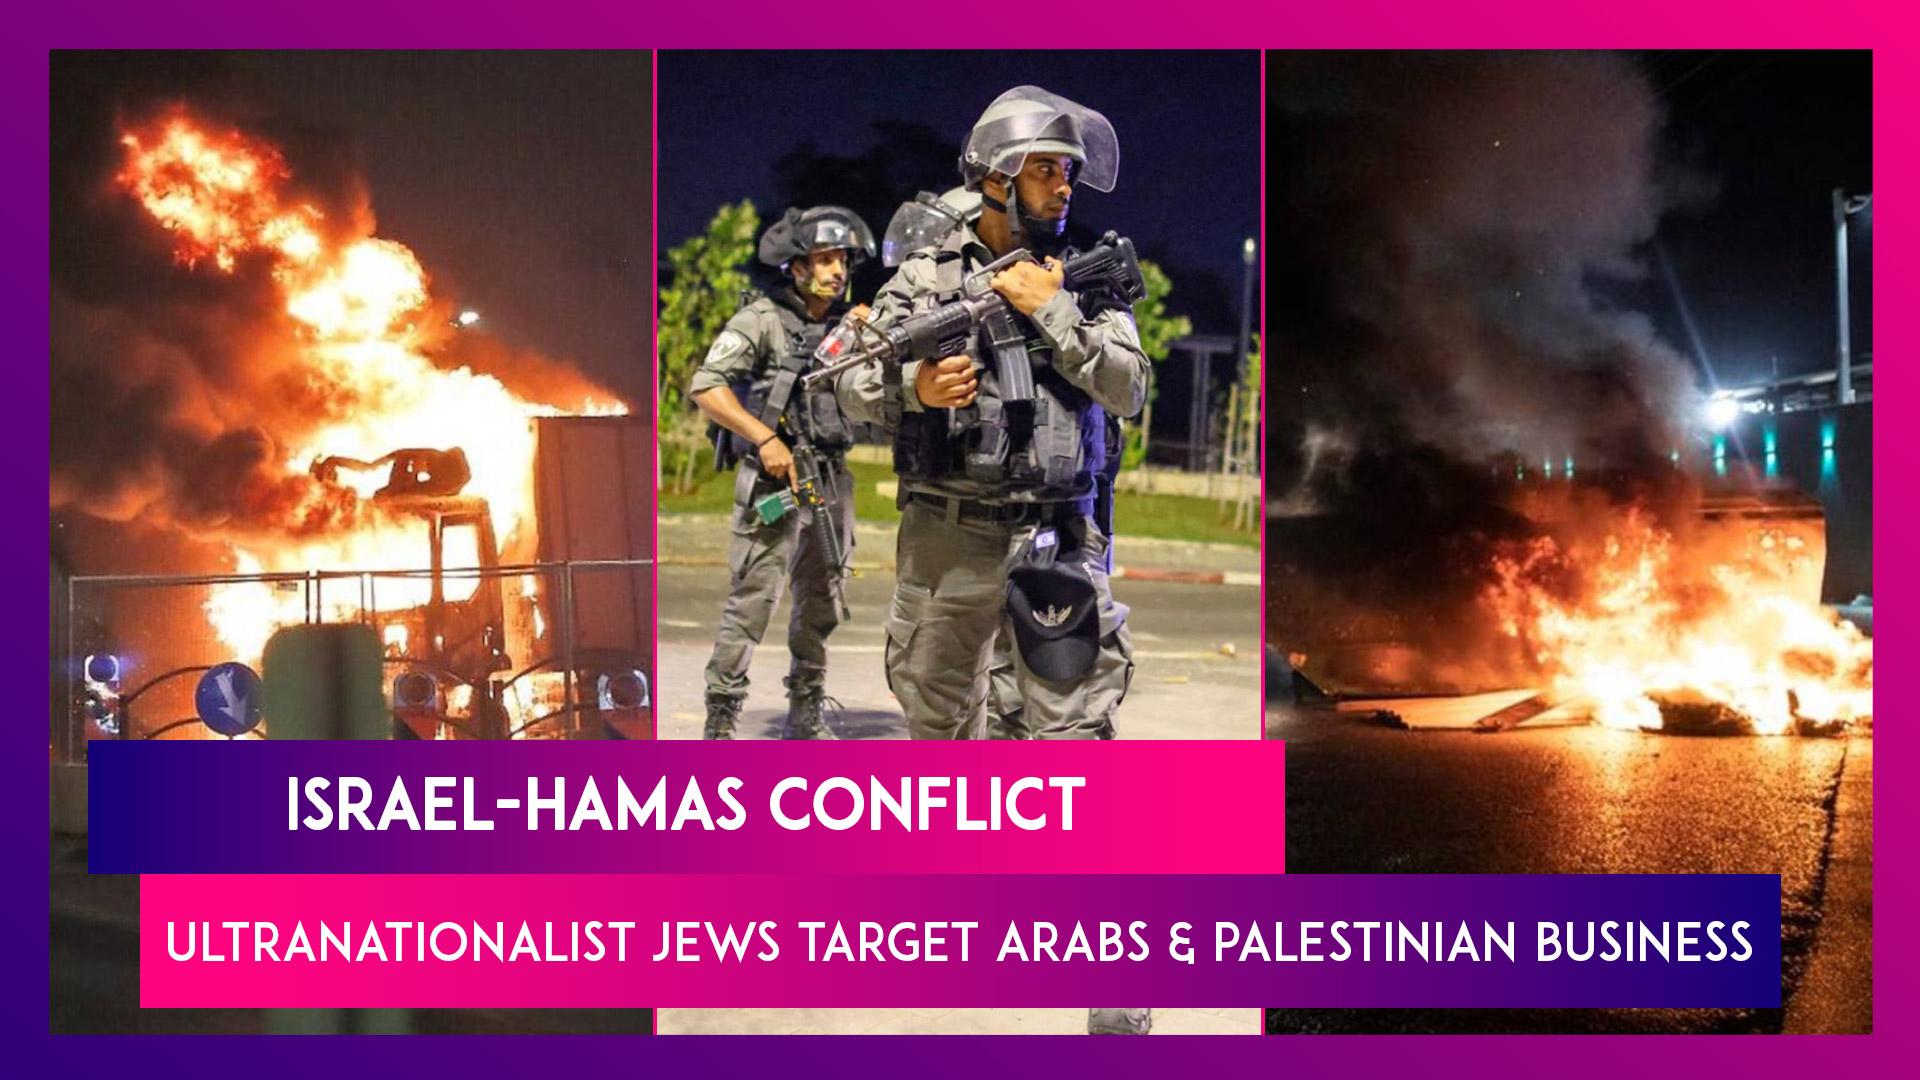 Israel-Hamas Conflict: Ultranationalist Jews Target Arabs & Palestinian Business As Violence Escalates